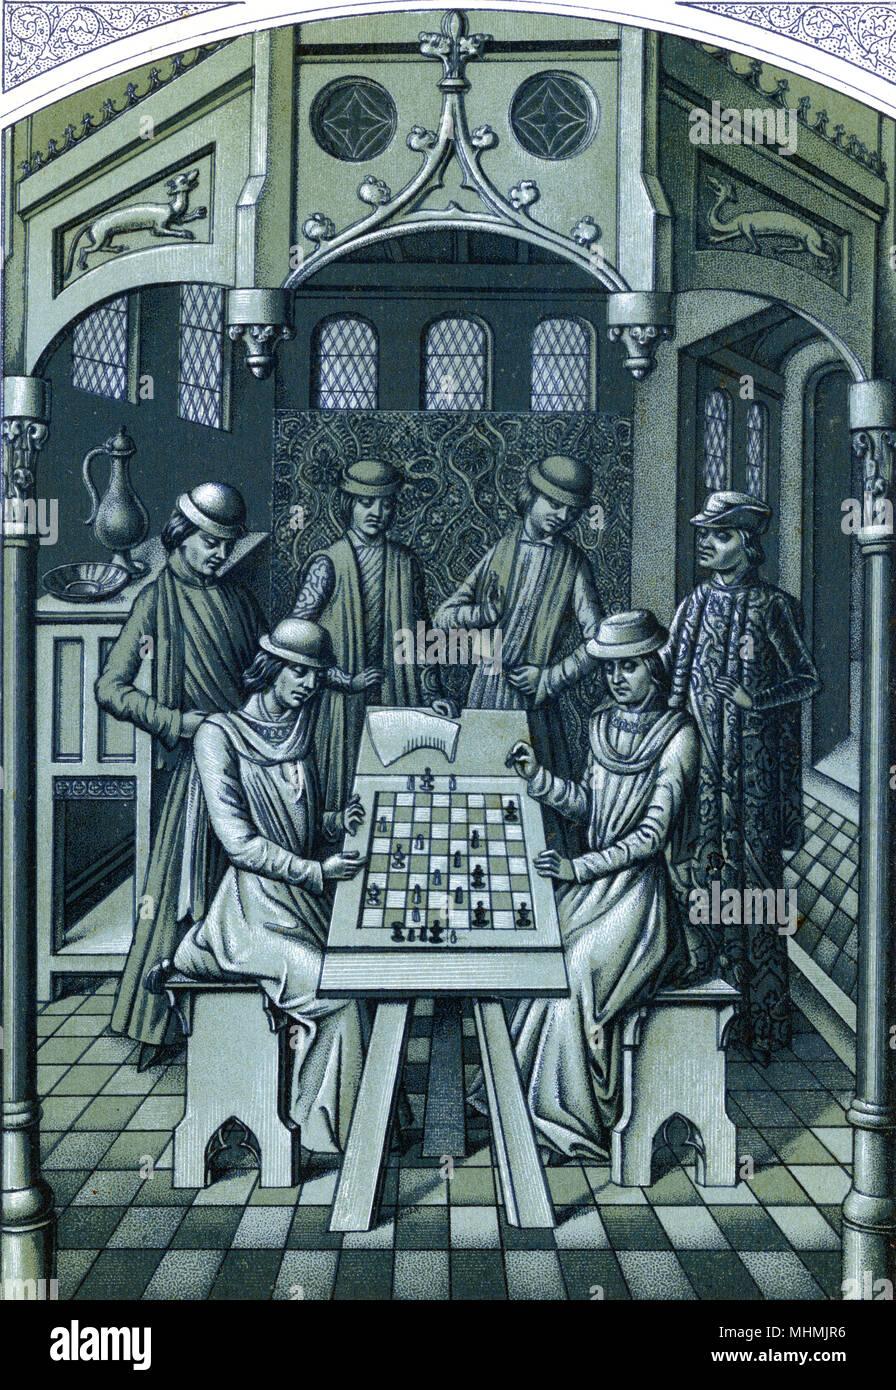 El rey Luis XI de Francia - que es él a la derecha - juega ajedrez en su castillo de Plessis-les-Tours Fecha: circa 1480 Foto de stock